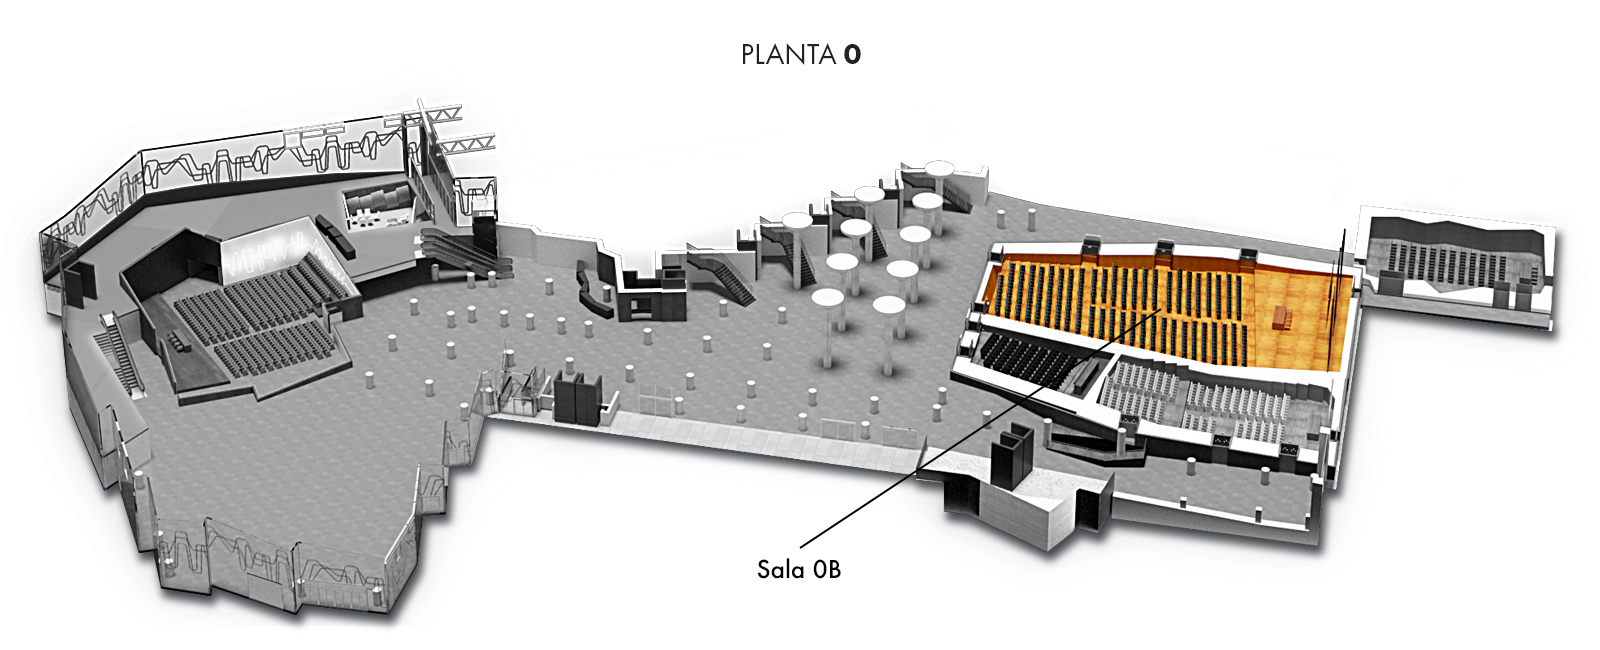 Sala 0B, Planta 0 | Palacio Euskalduna Jauregia